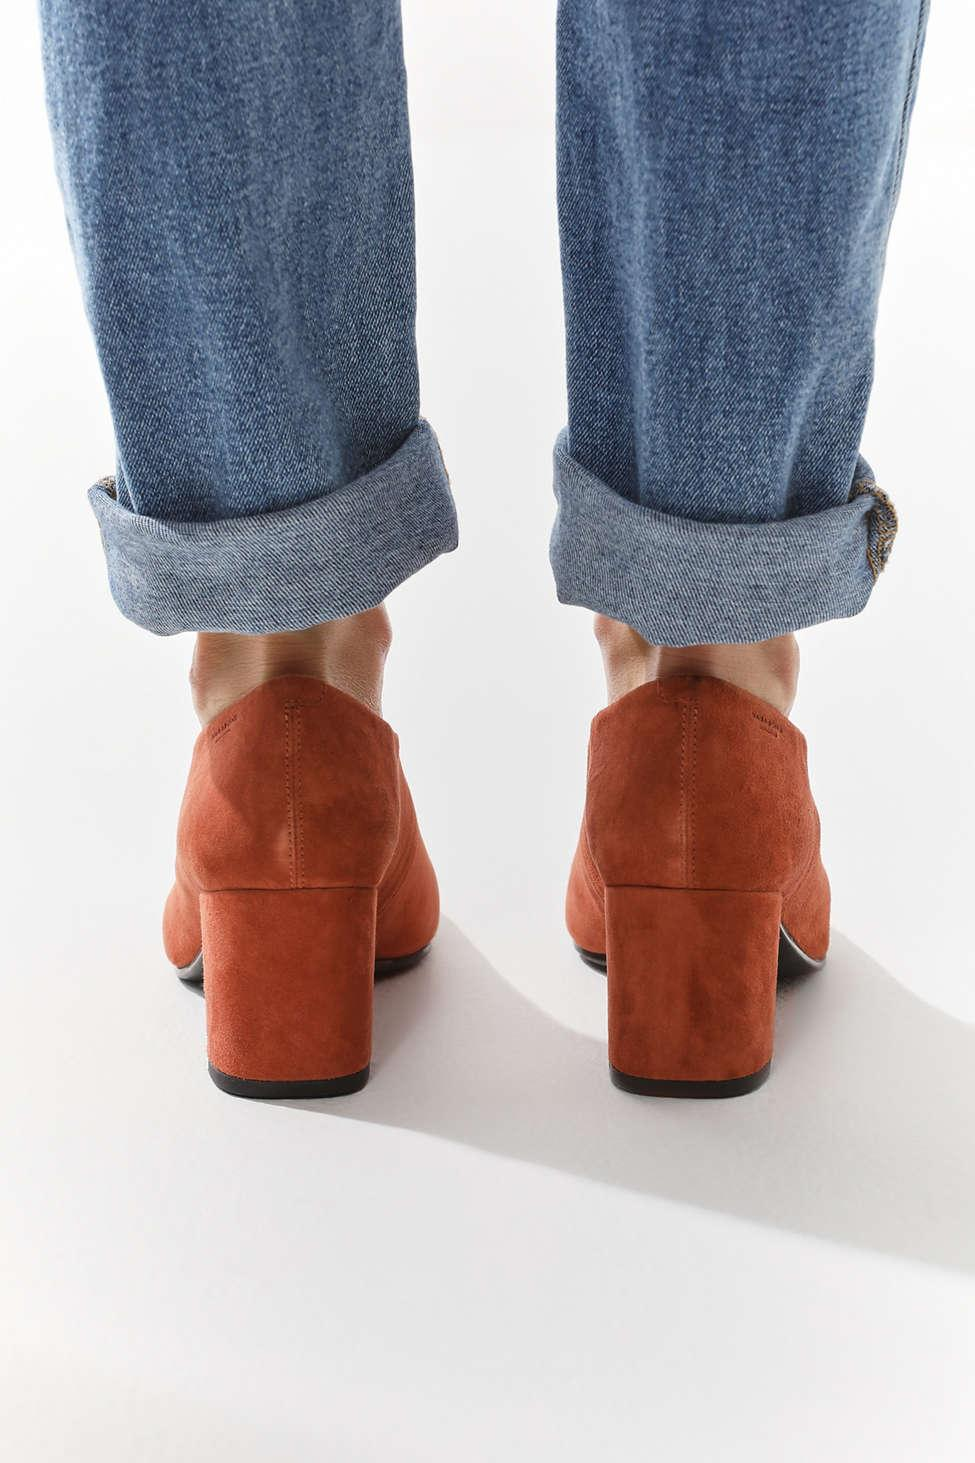 vagabond shoemakers tracy pump